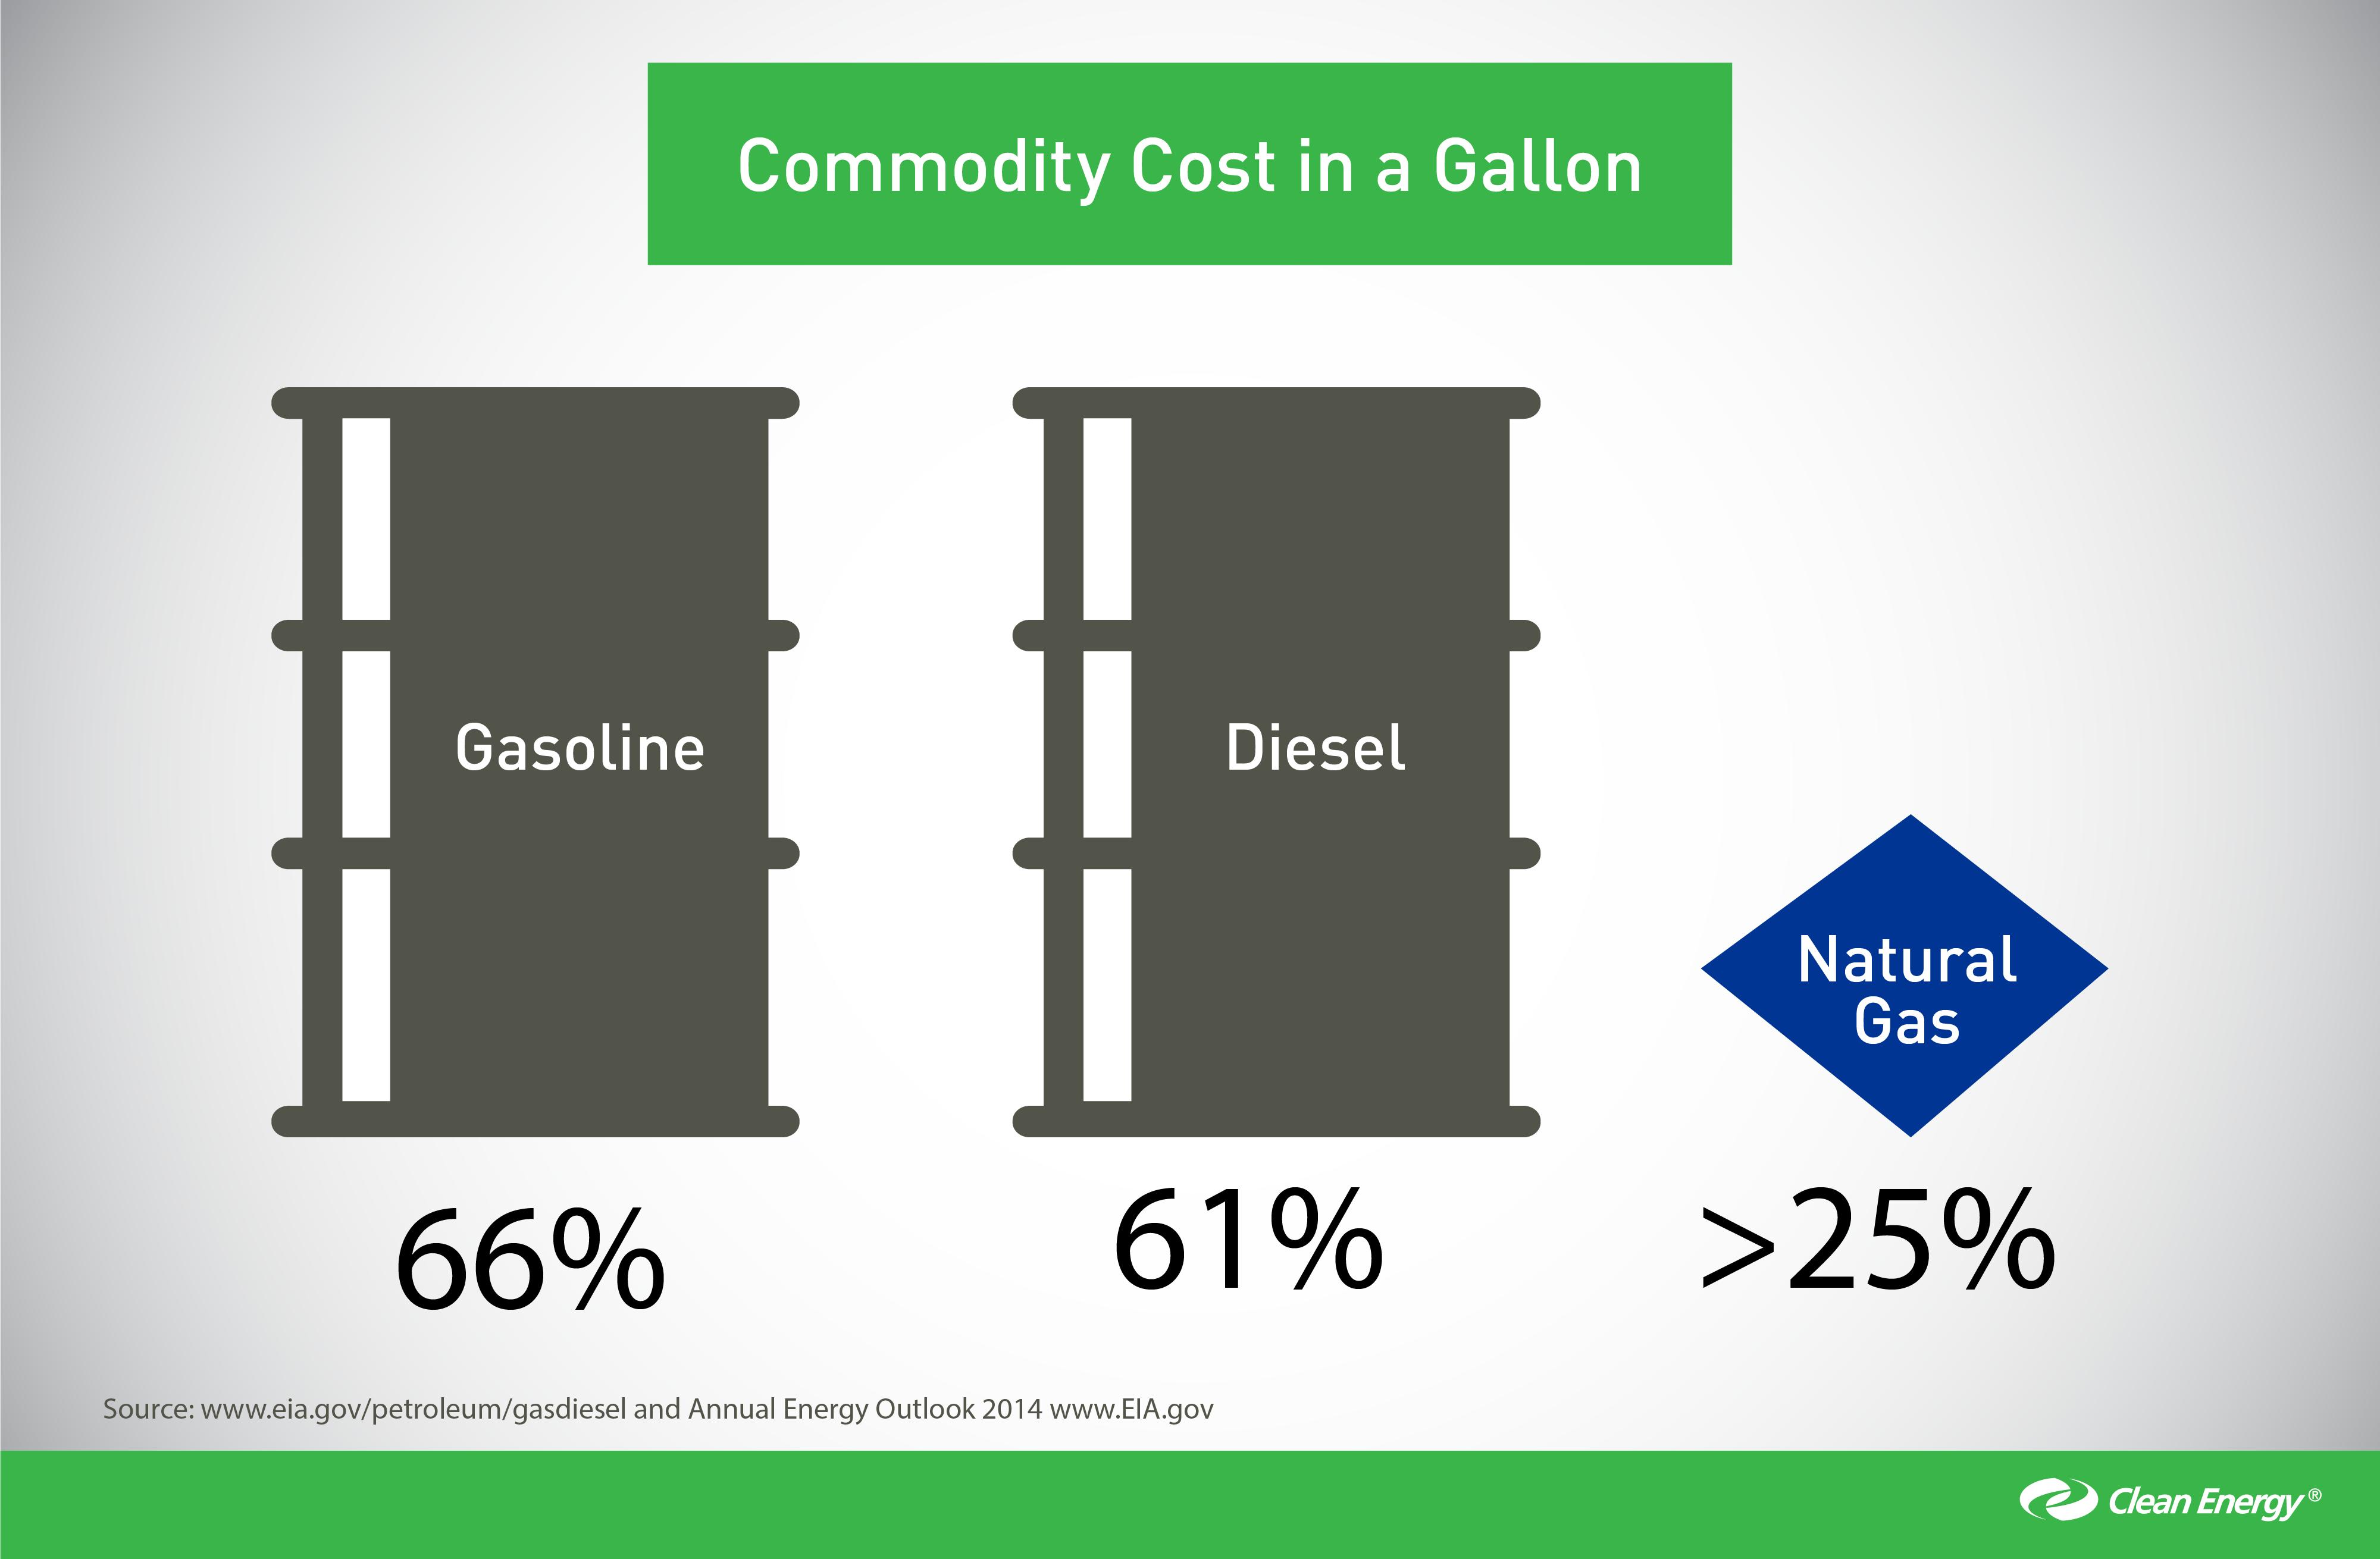 Natural Gas Commodity Gallon